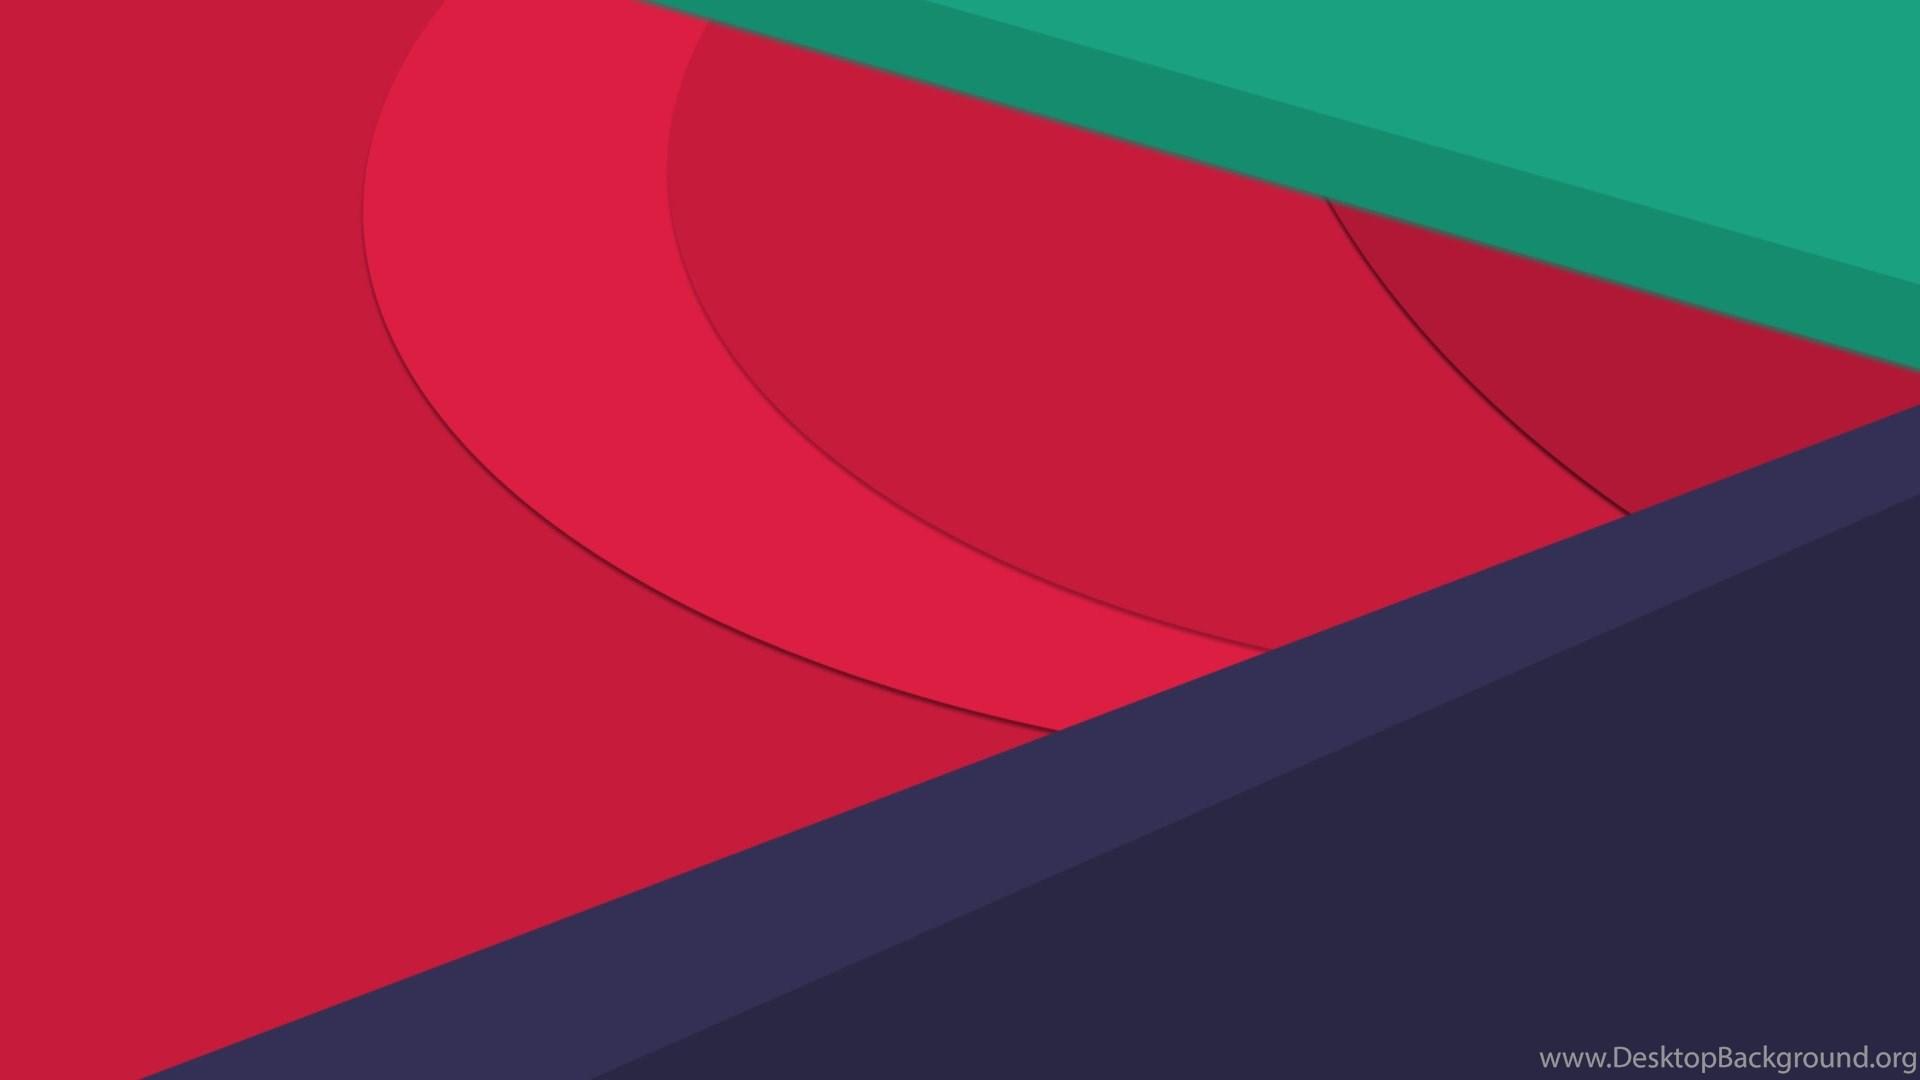 Android kitkat wallpapers for desktop 1920x1080 full hd desktop popular voltagebd Image collections